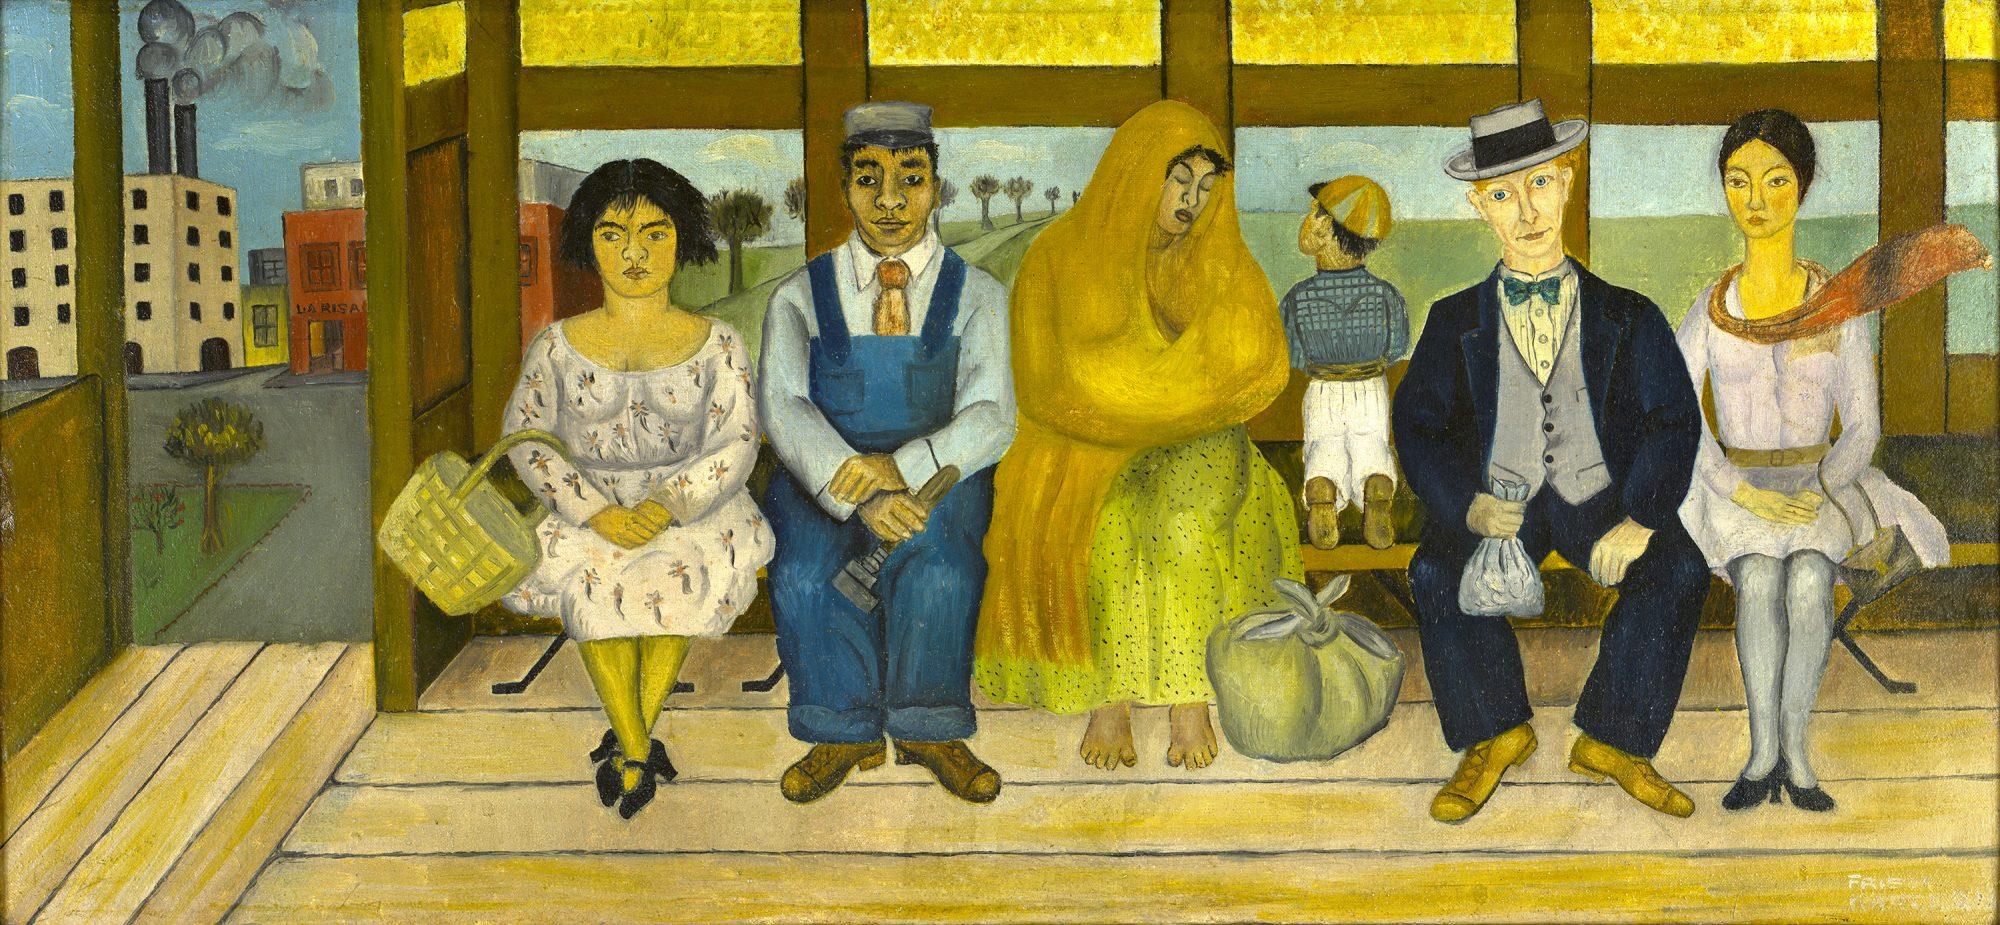 Frida Kahlo, The Bus